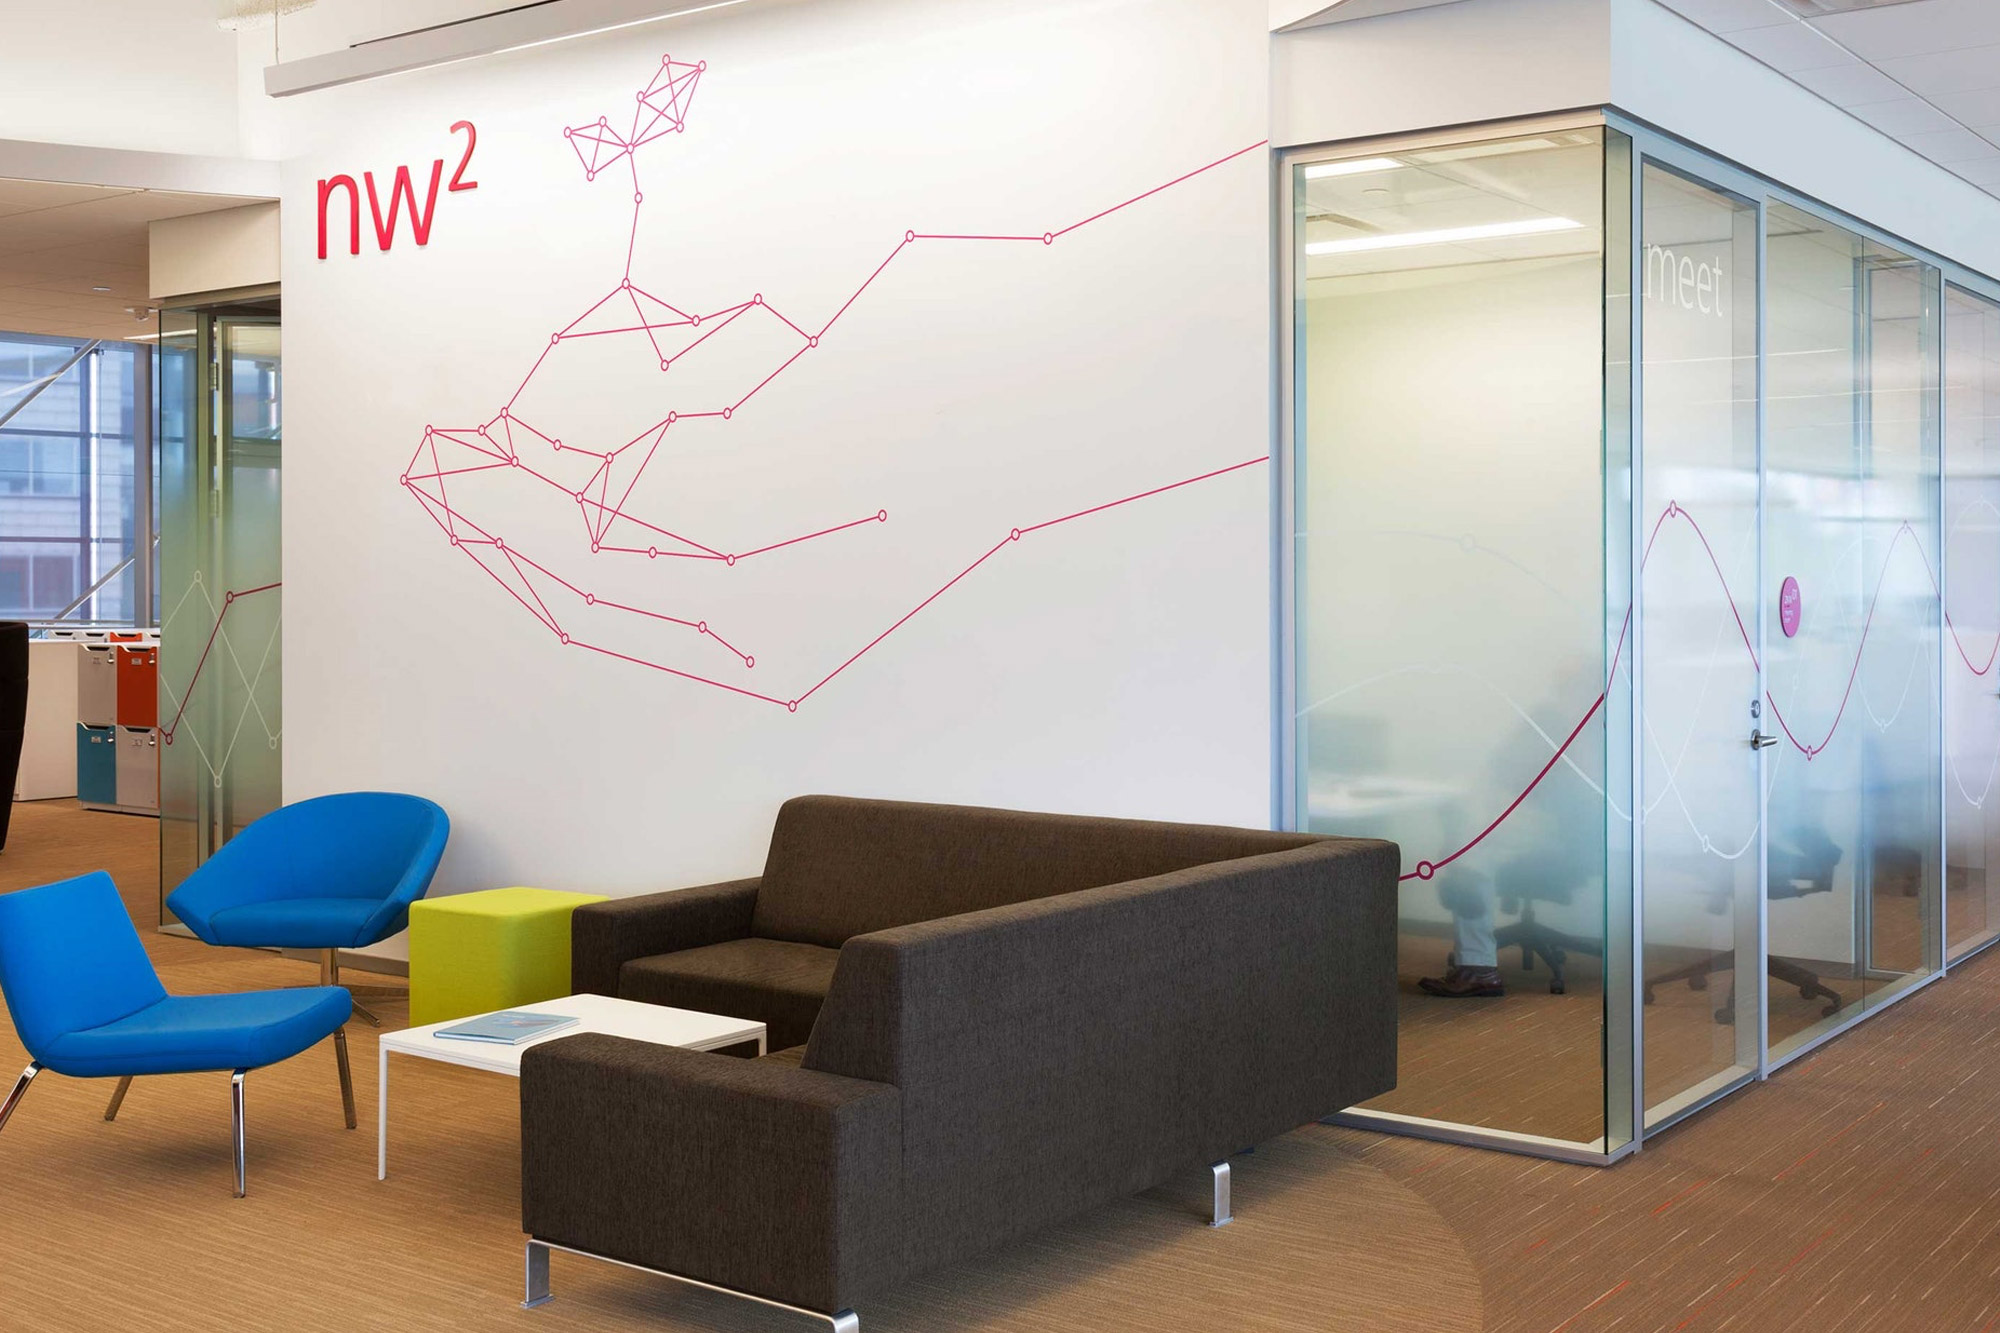 GlaxoSmithKline US HQ. Designed by Pentagram @enviromeant.com